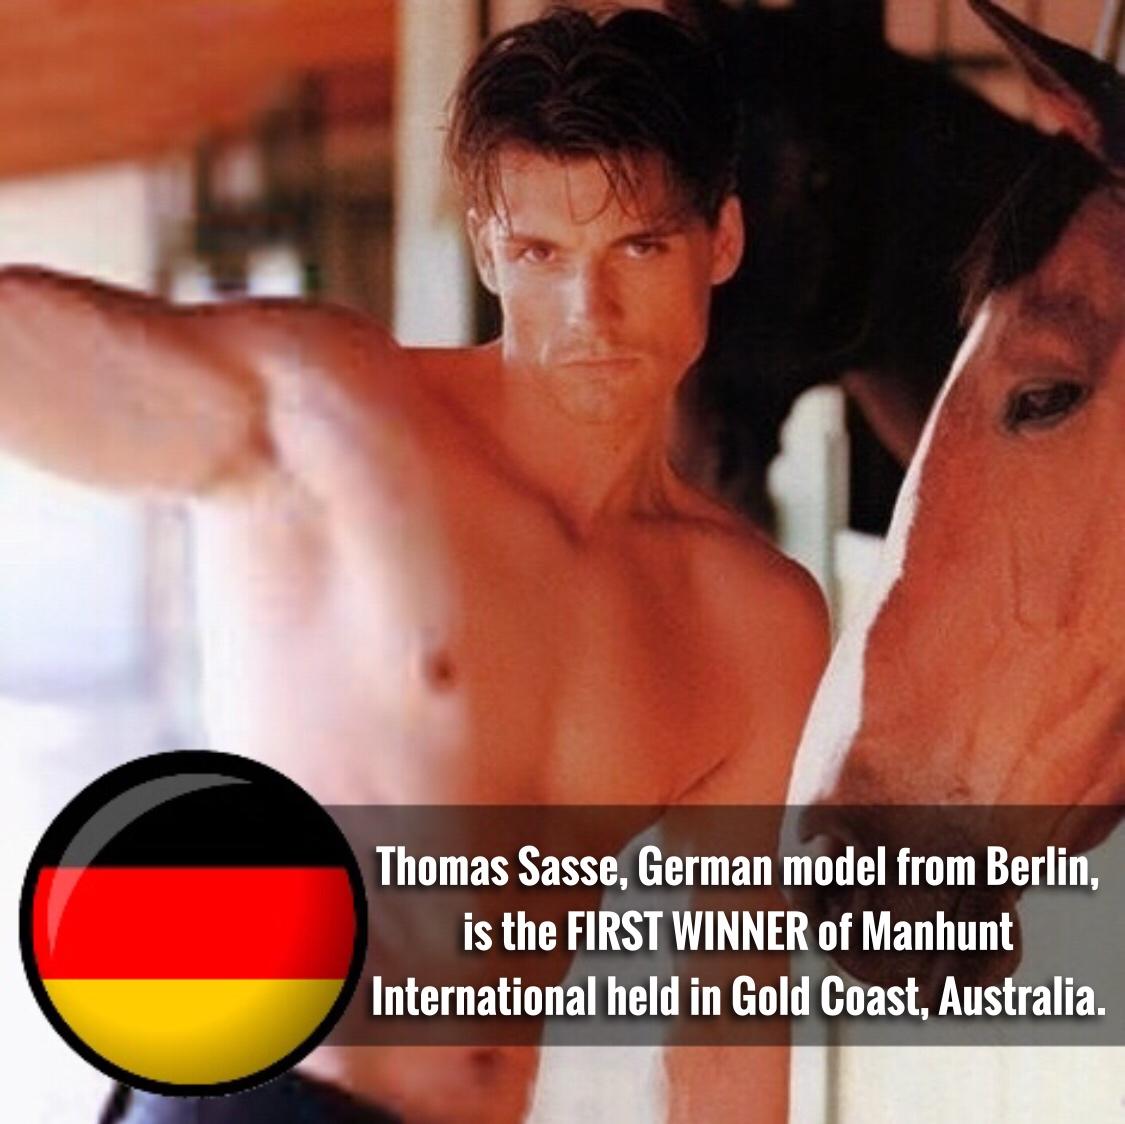 thomas sasse, manhunt international 1993. Enligh13